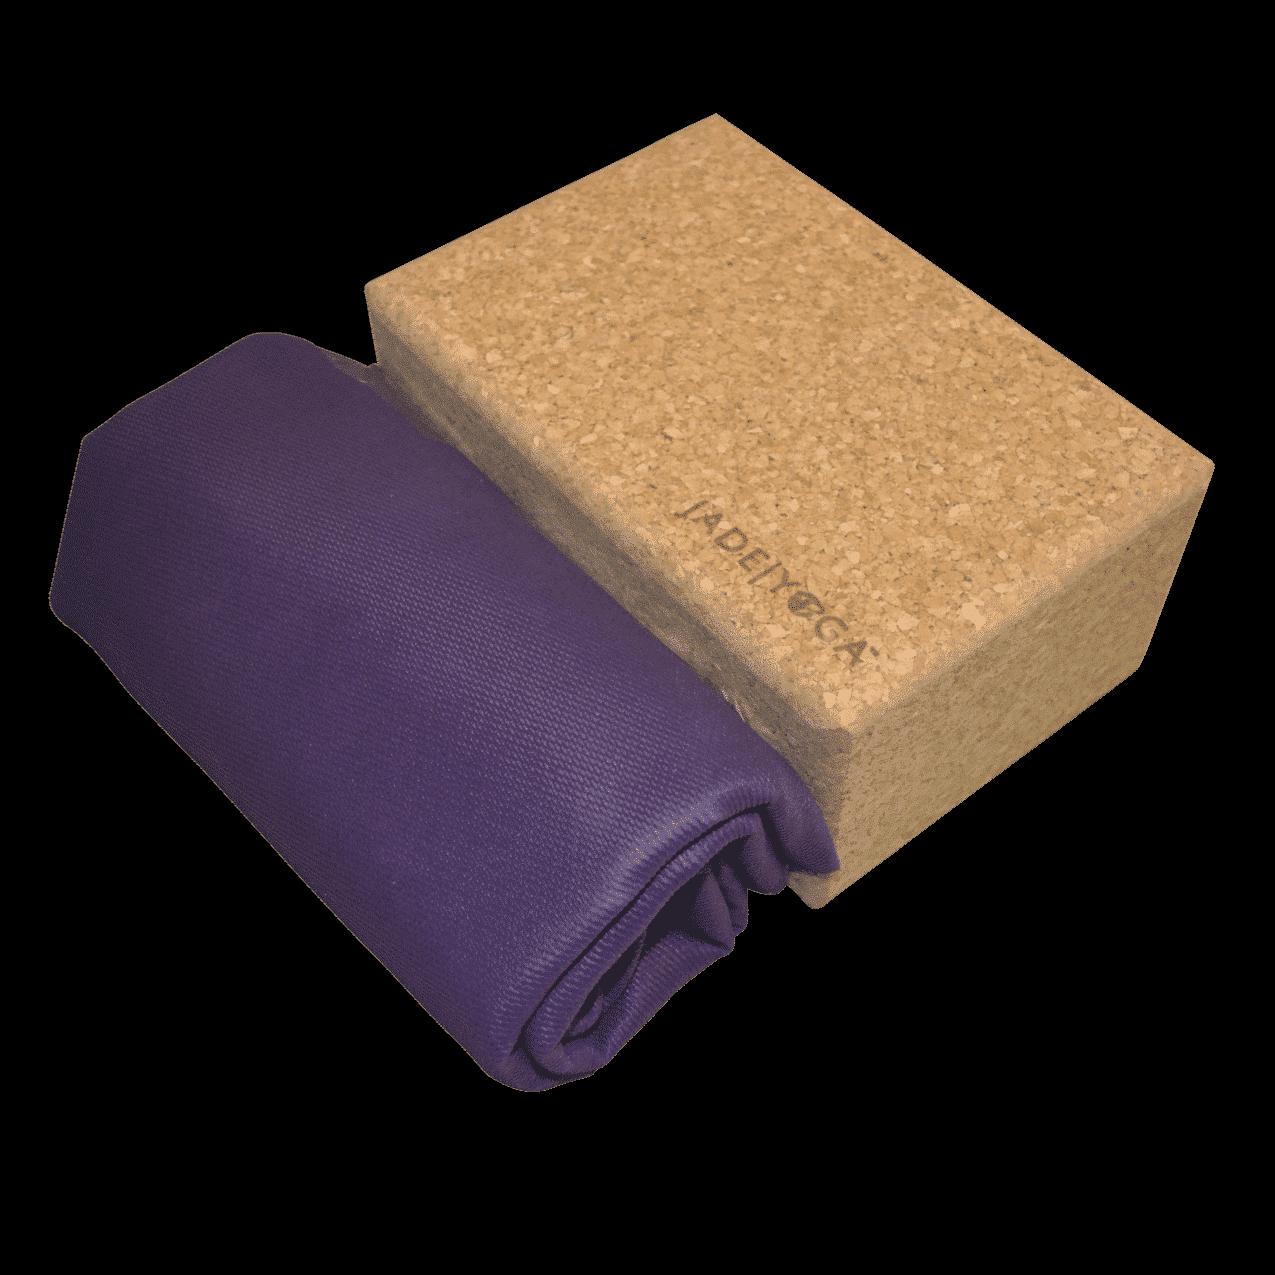 Voyager Purple versus block